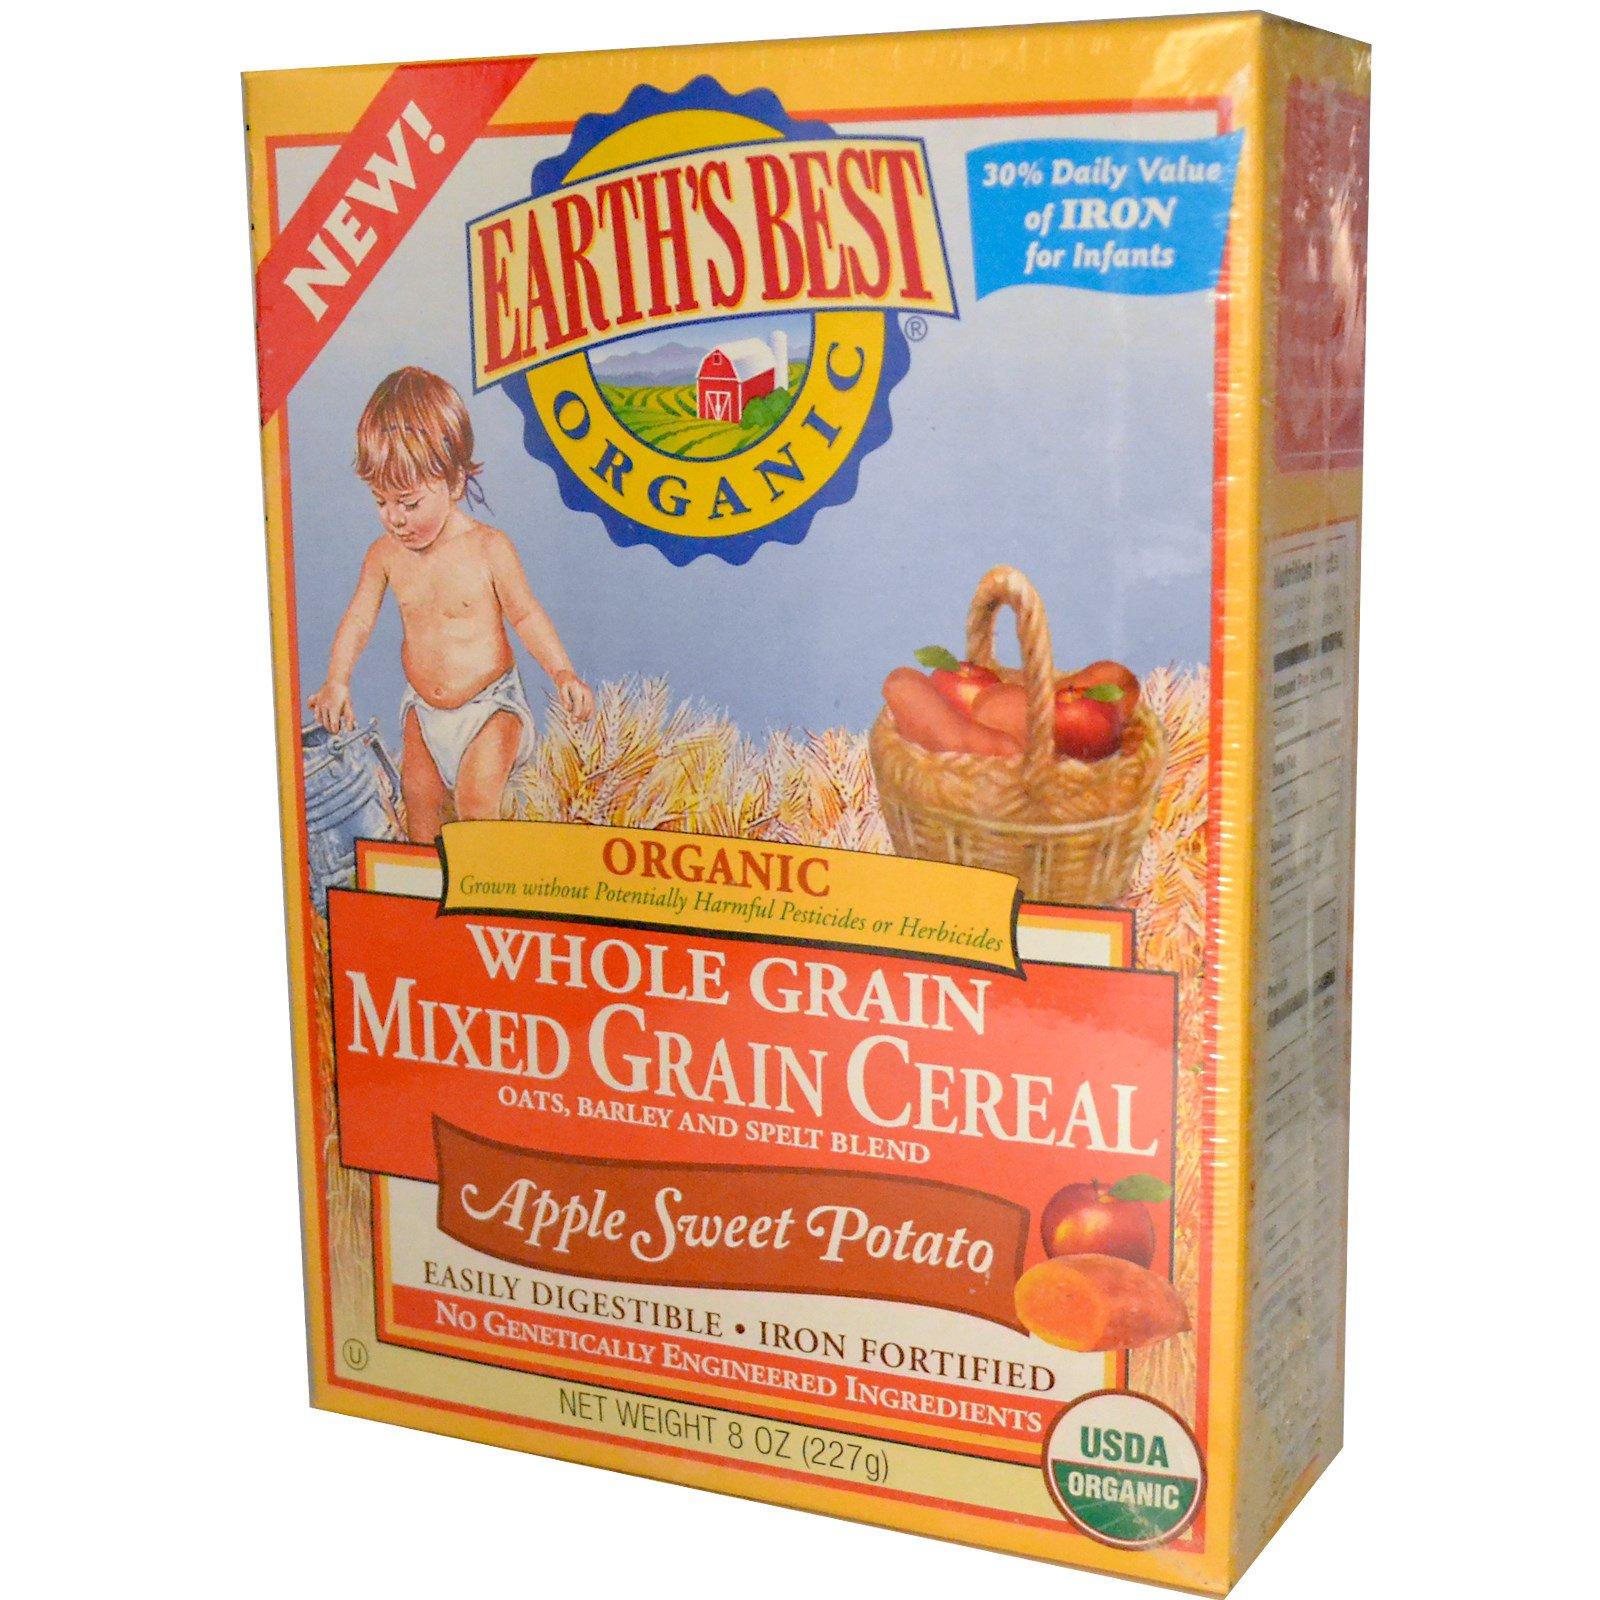 EARTH'S BEST 爱思贝 有机全麦混合米粉 苹果红薯味 227g